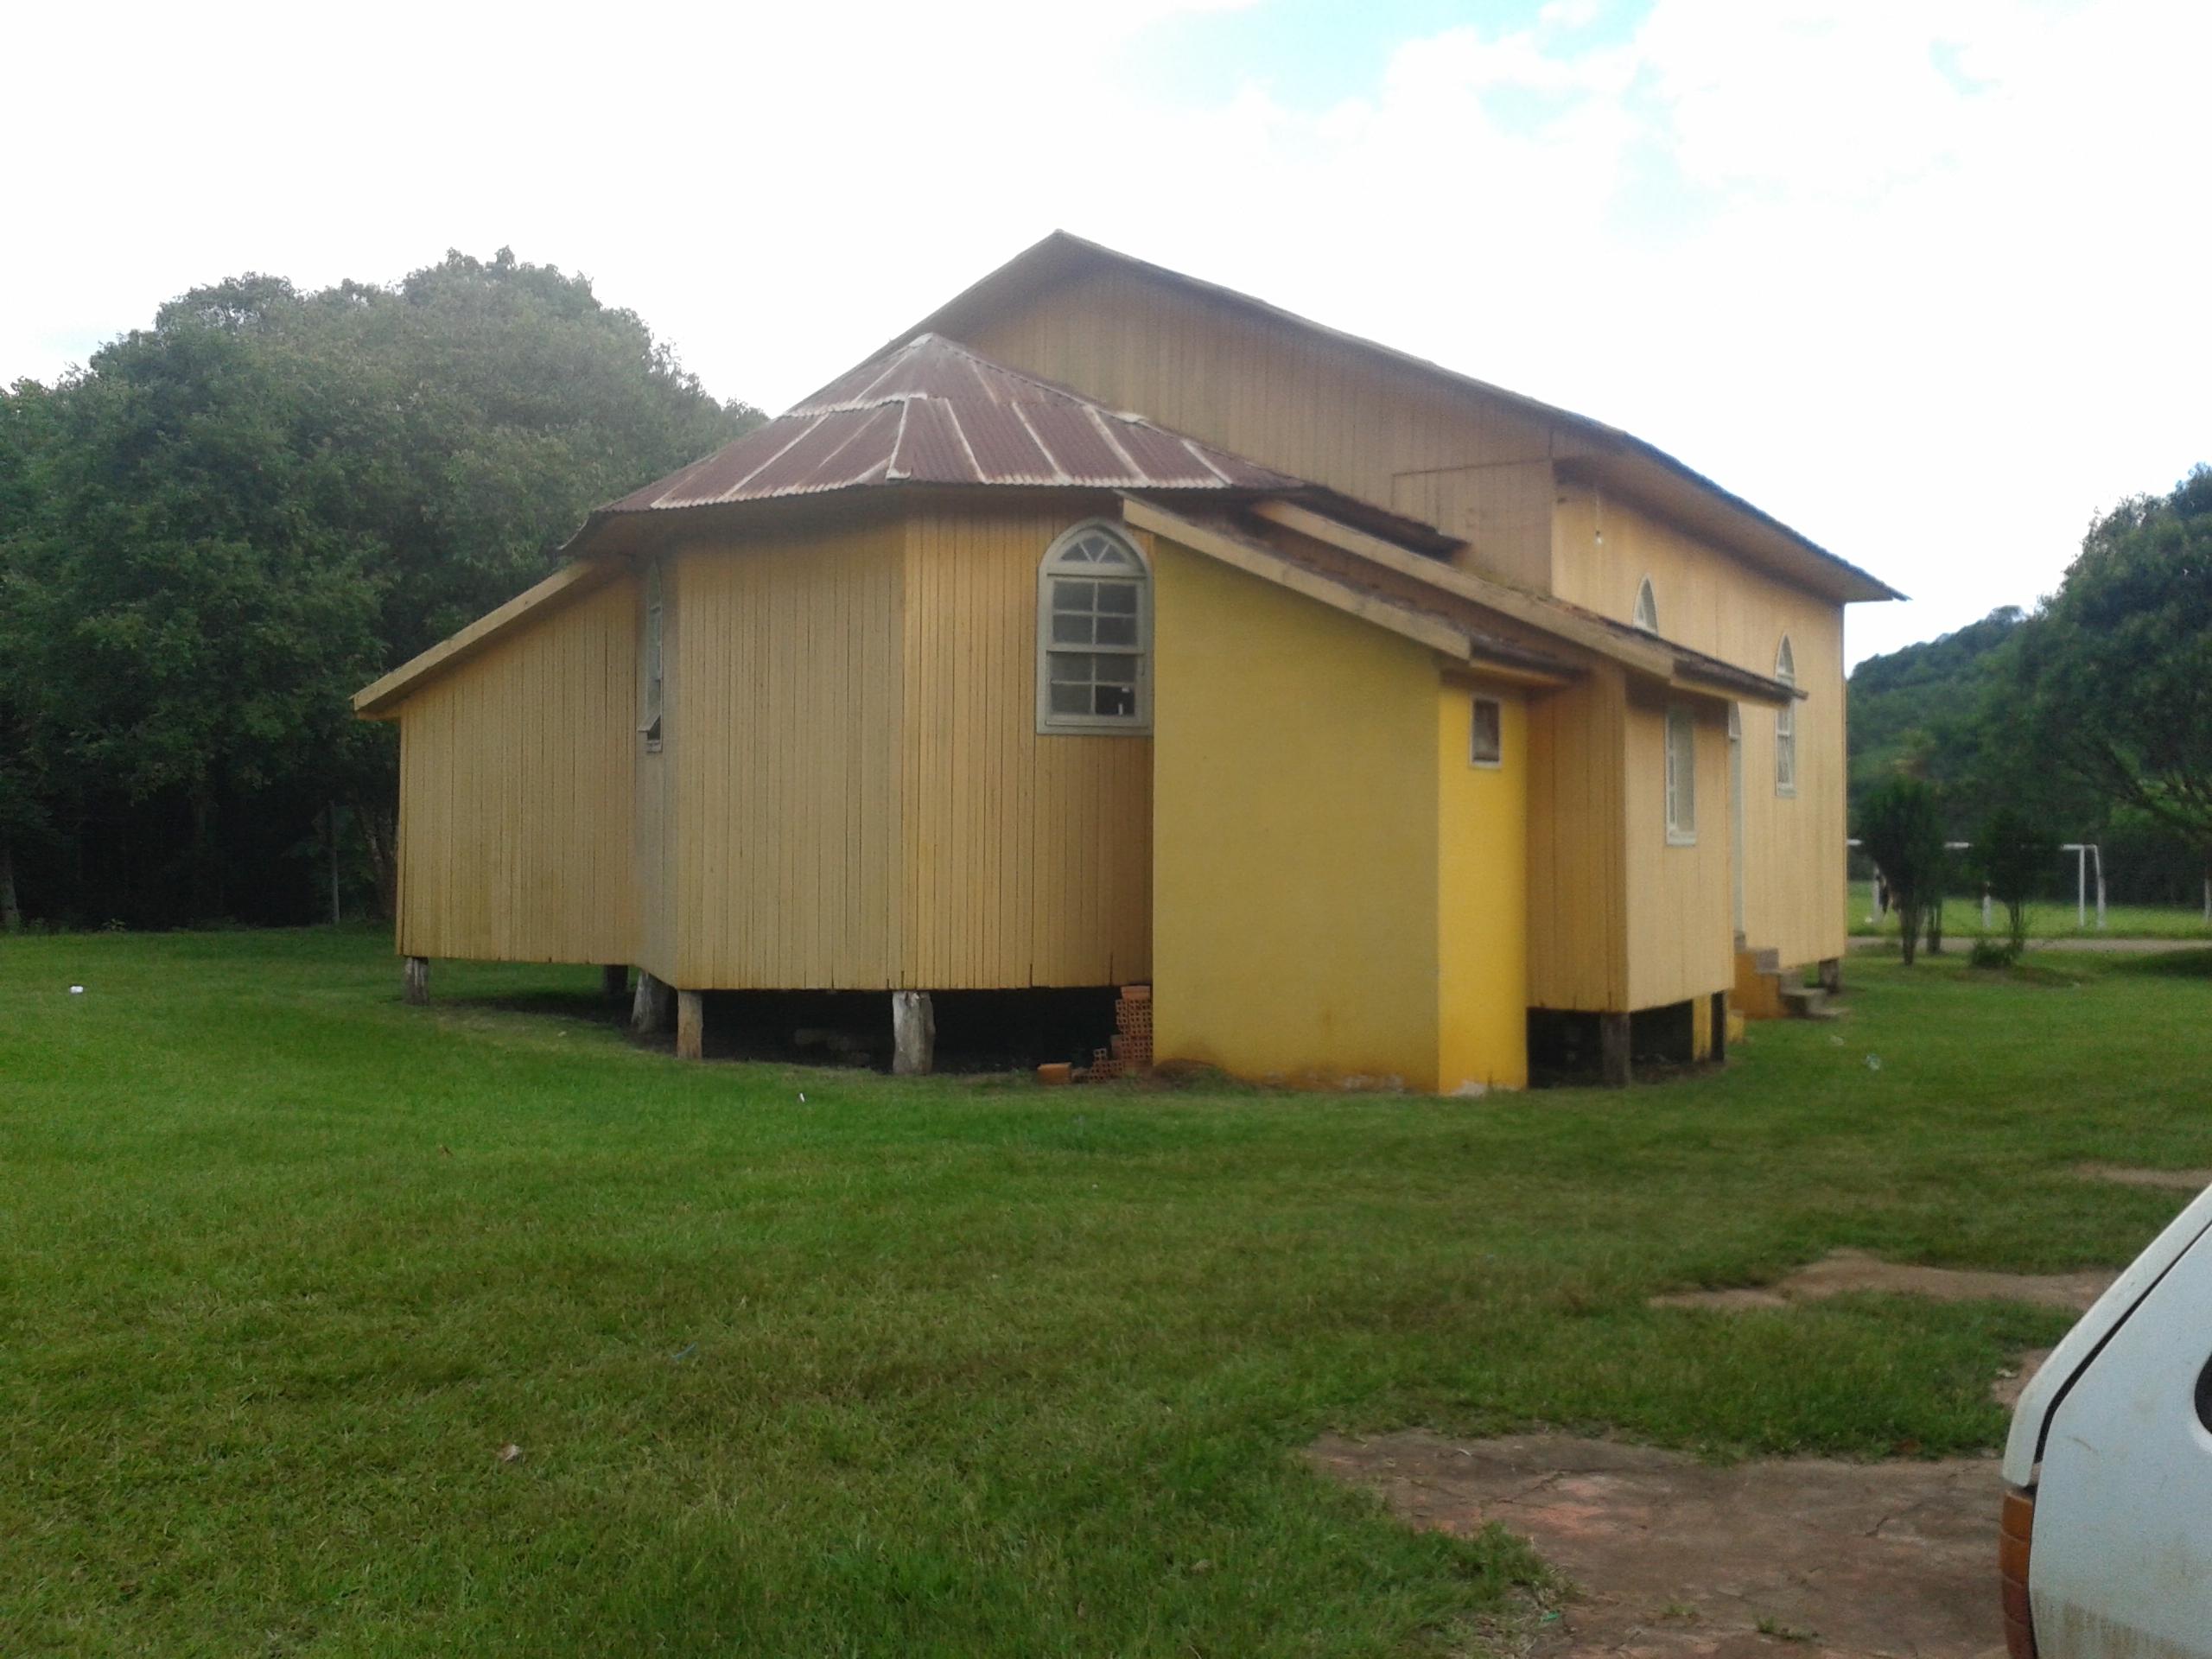 Serra Alta Santa Catarina fonte: upload.wikimedia.org